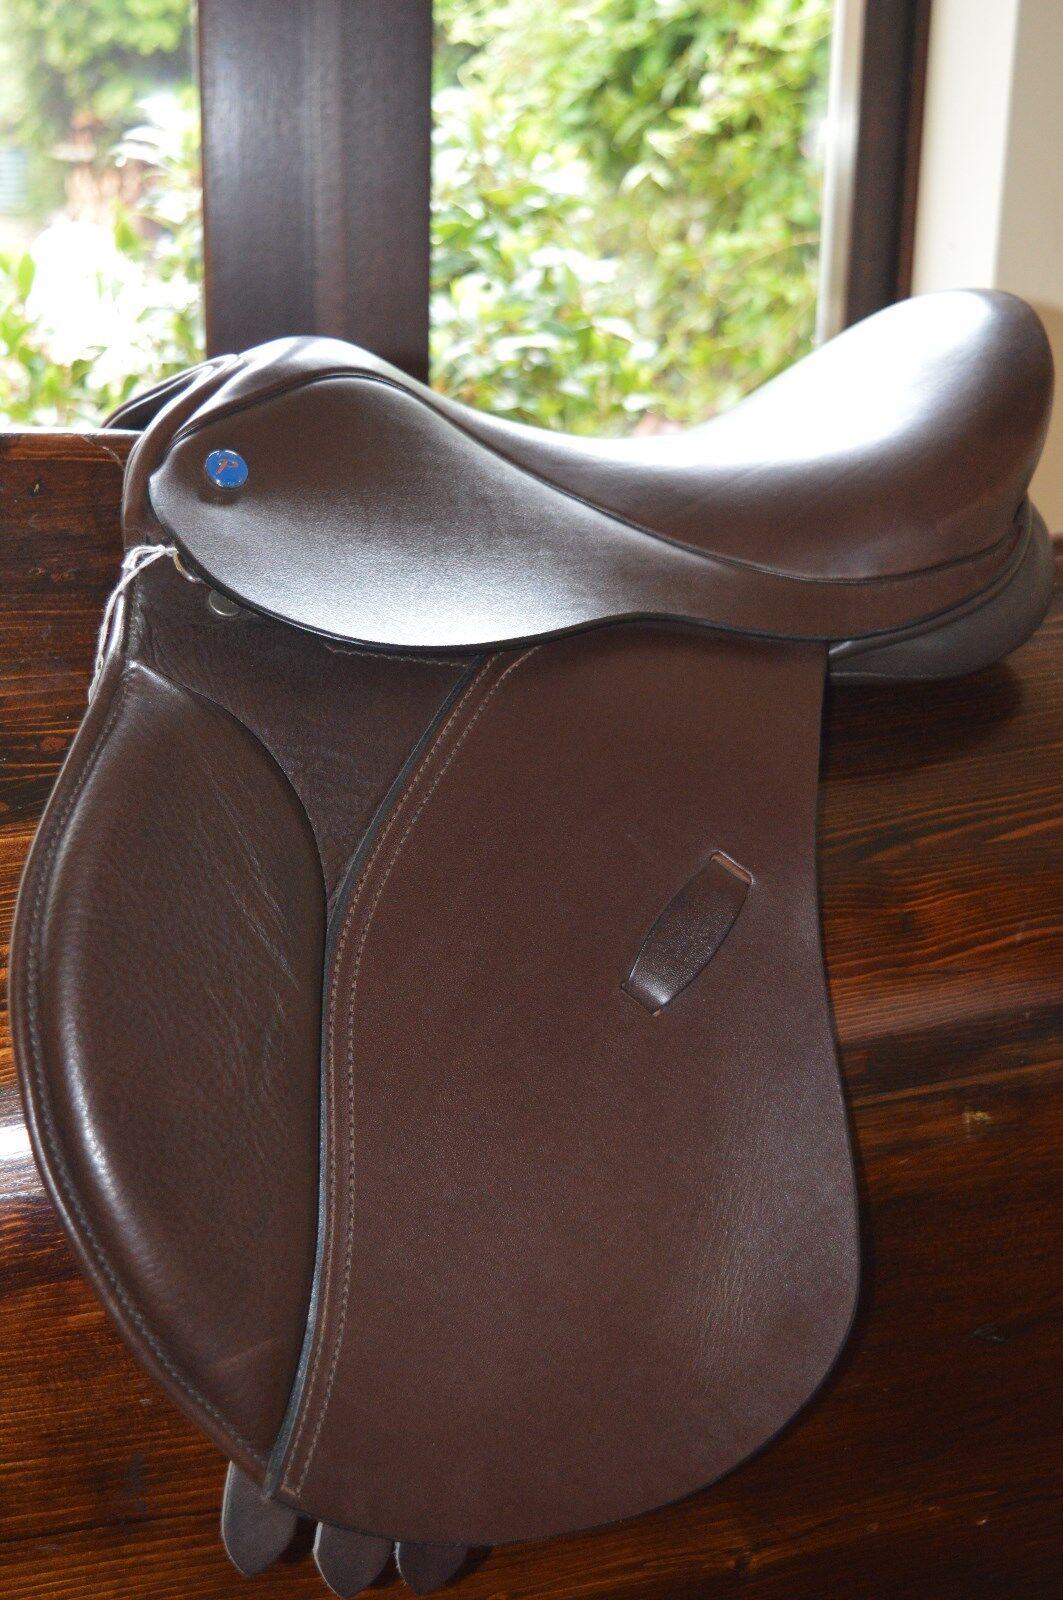 Pony Saddle Shires Havanna Brown wide fit 14 14.5